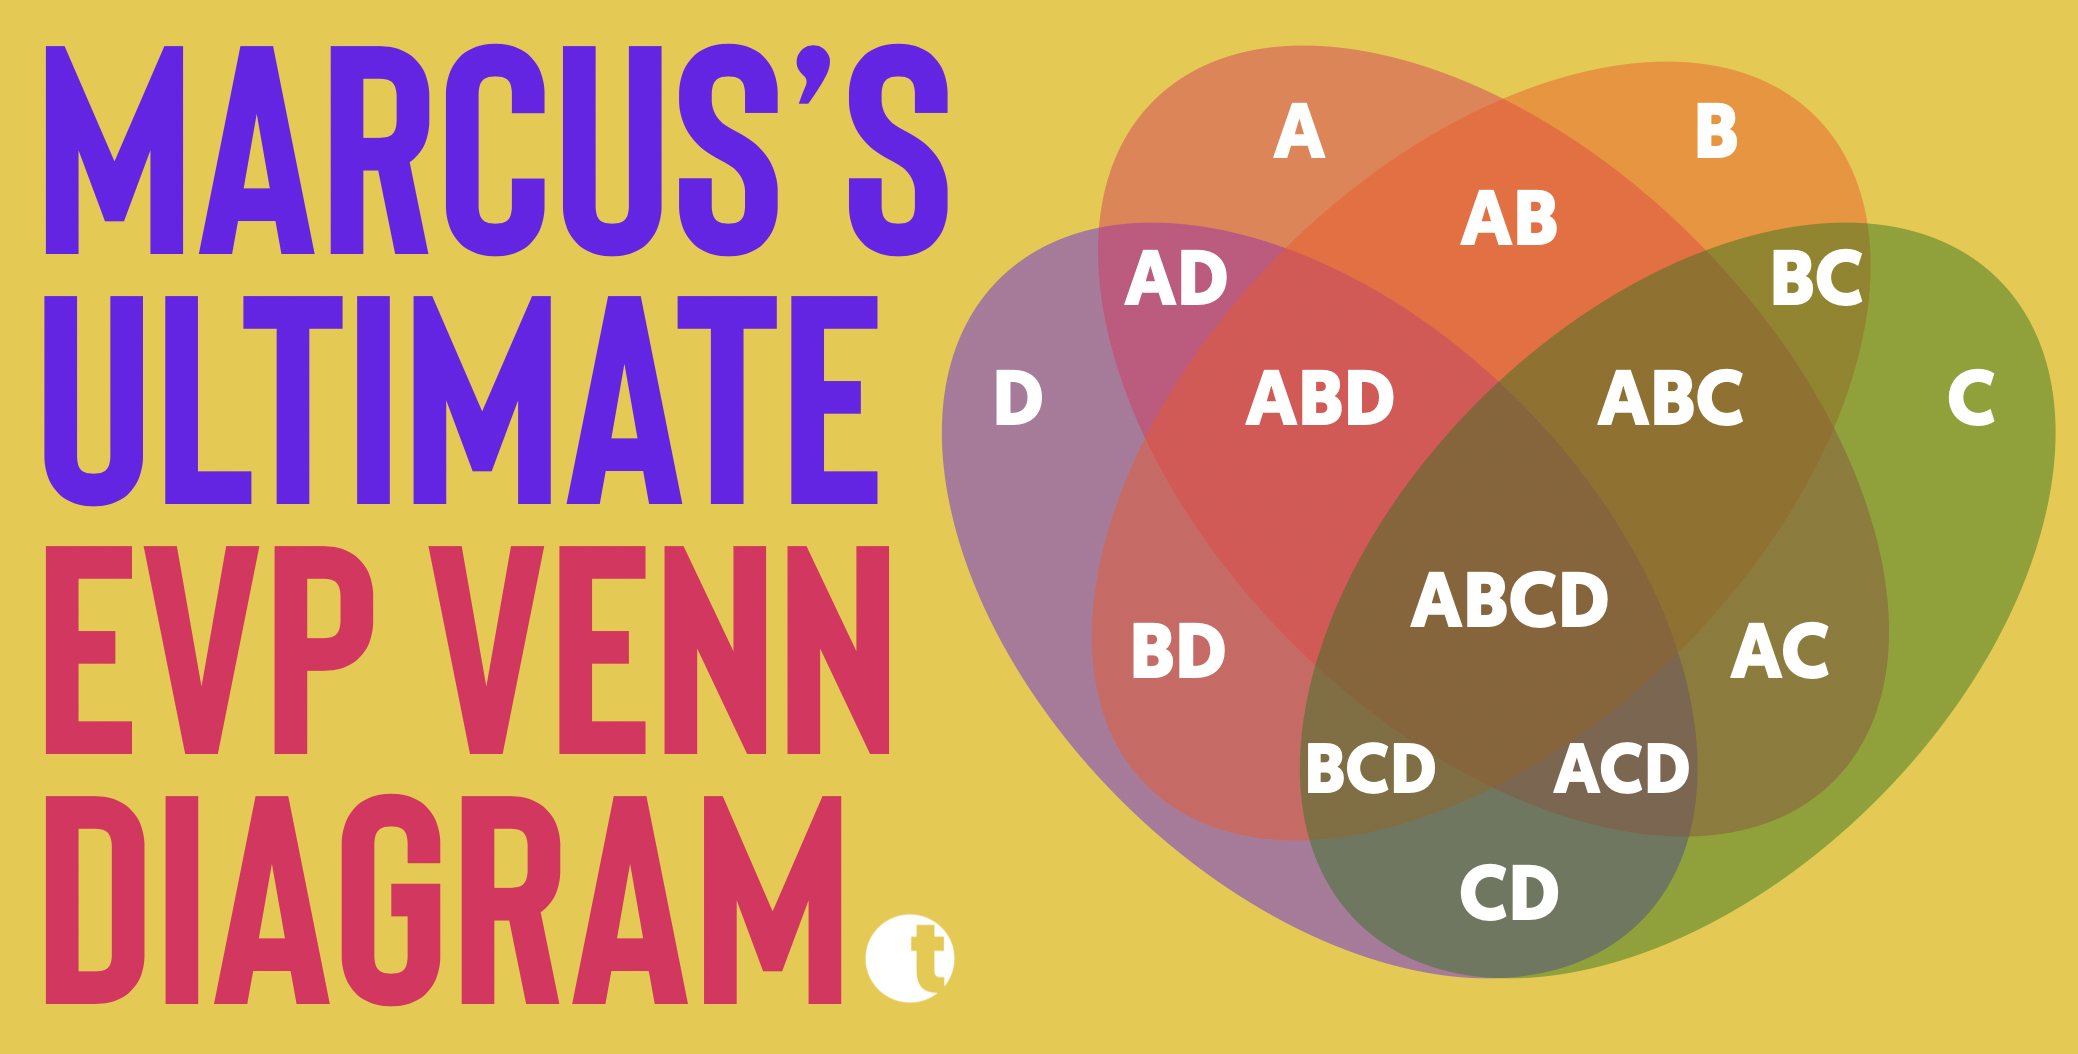 Marcus's Ultimate EVP Venn Diagram